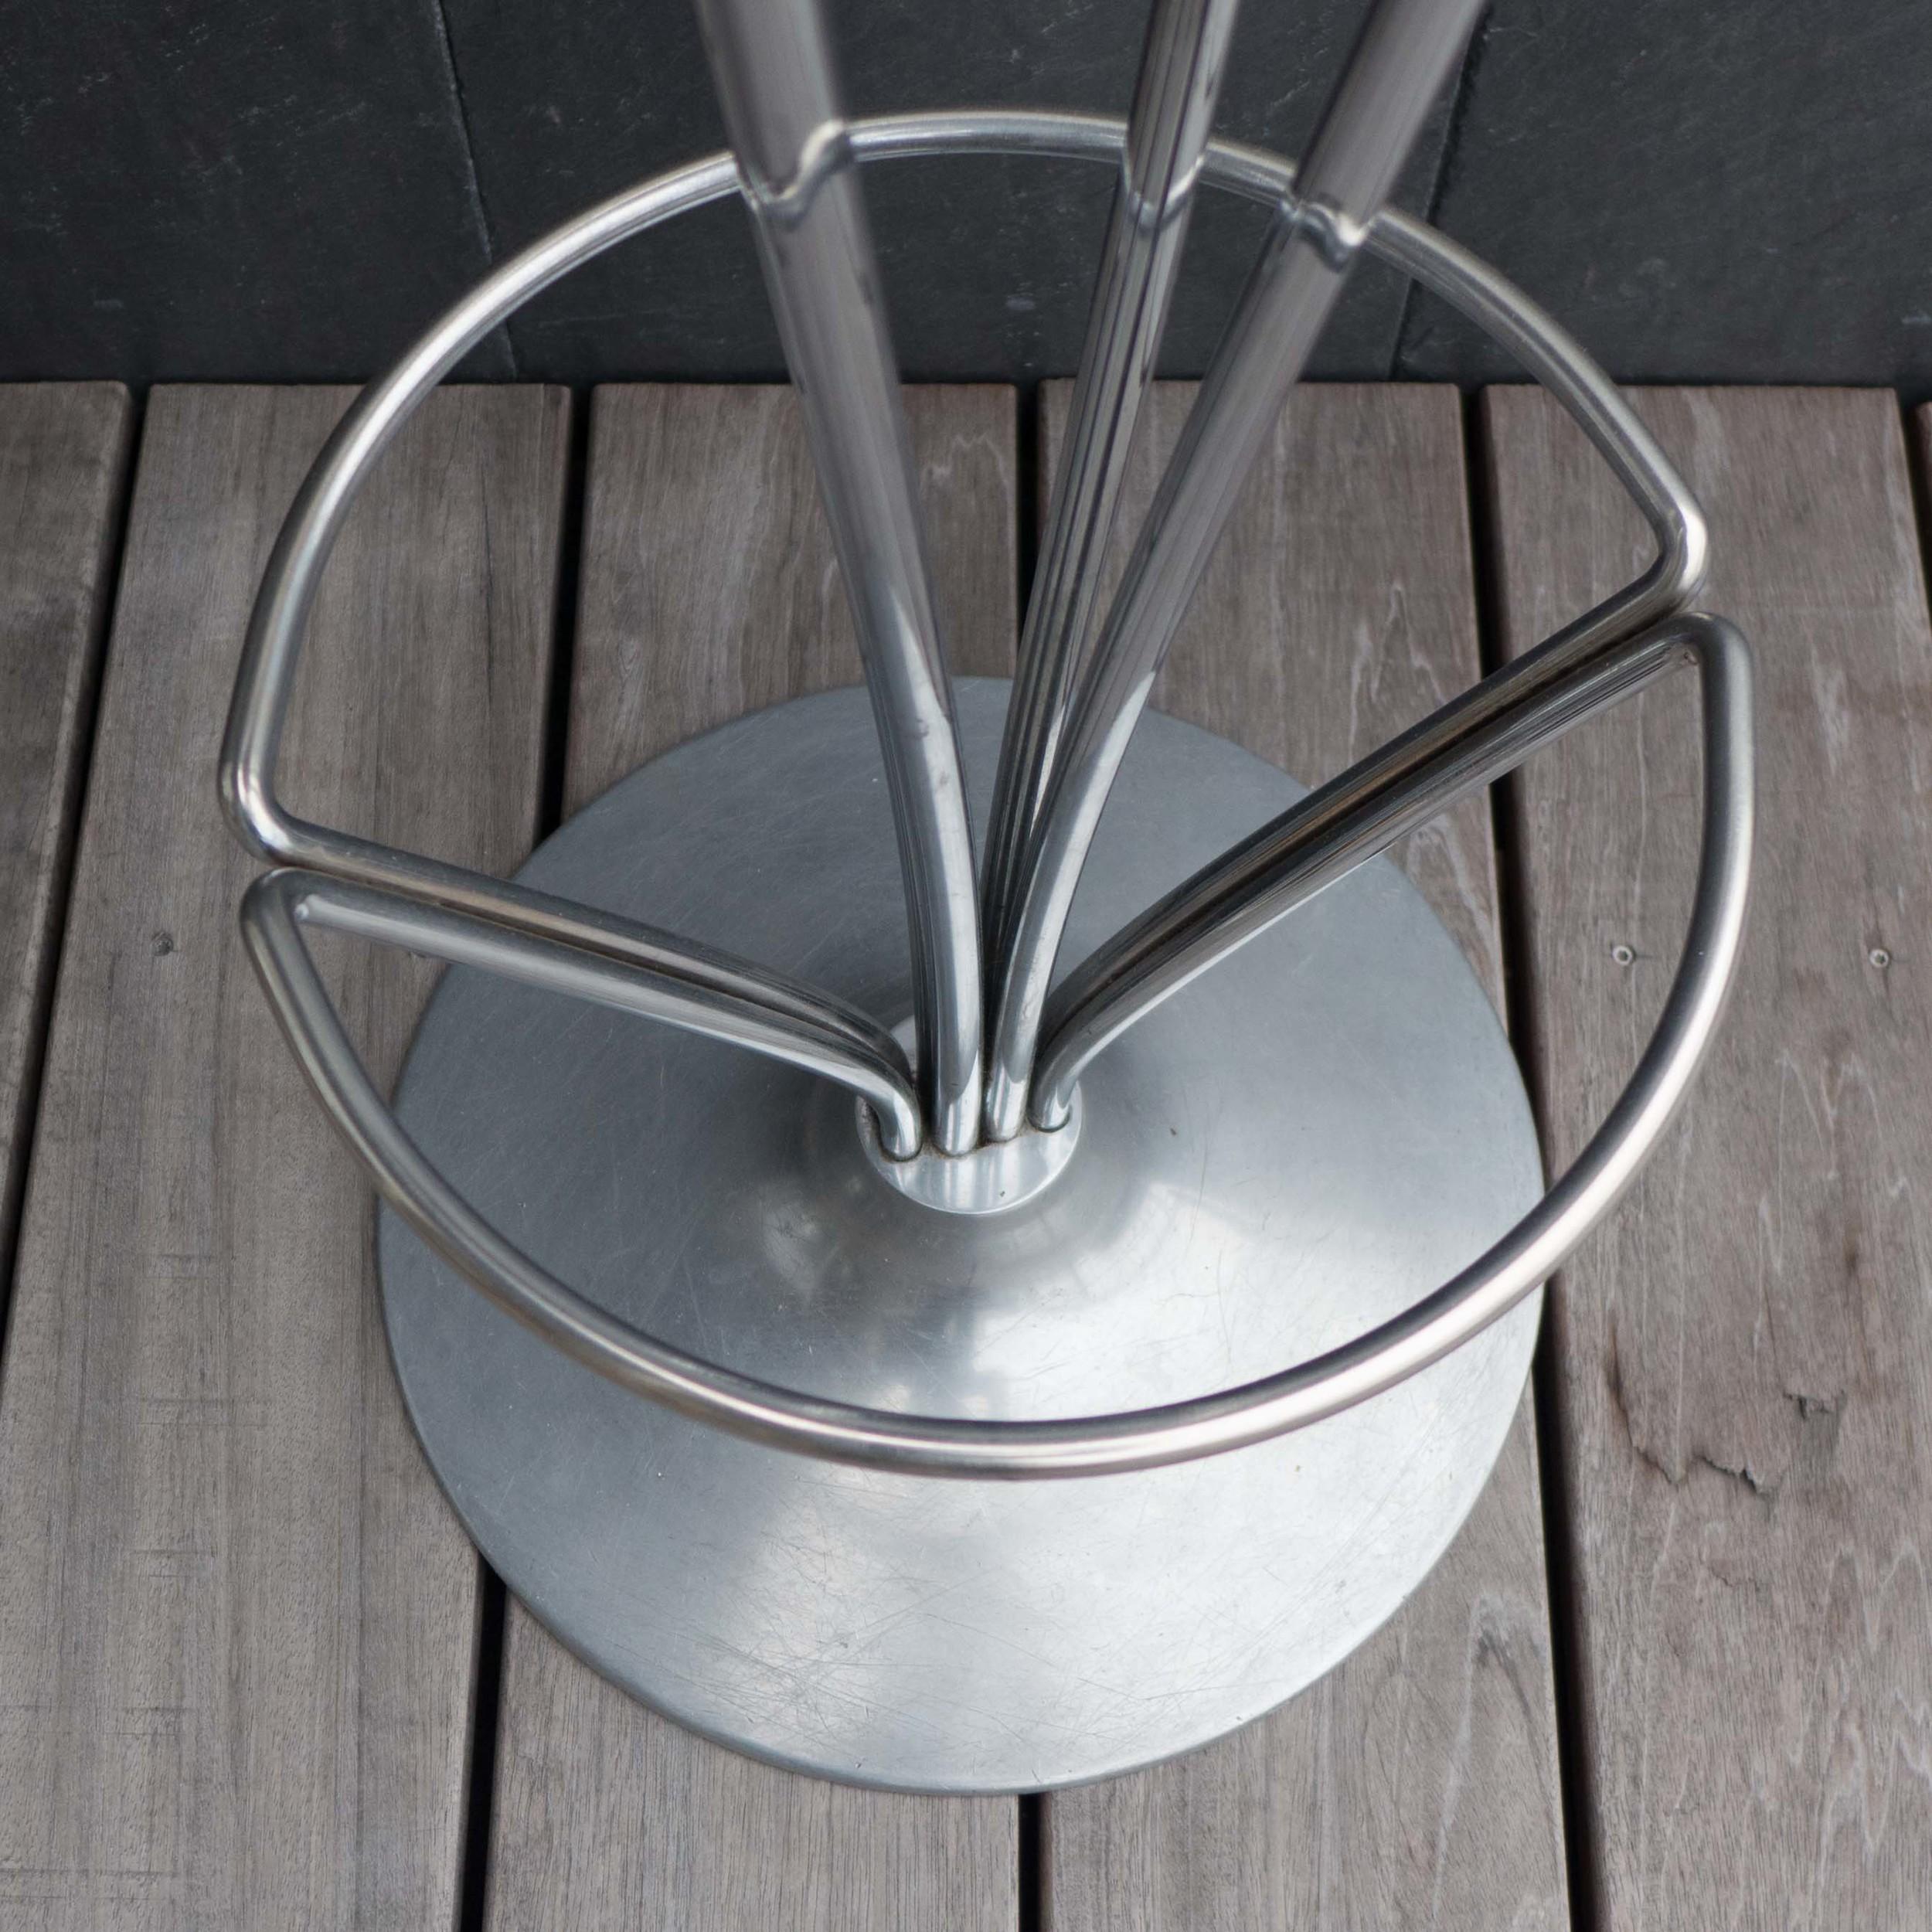 Hein stool-2.jpg